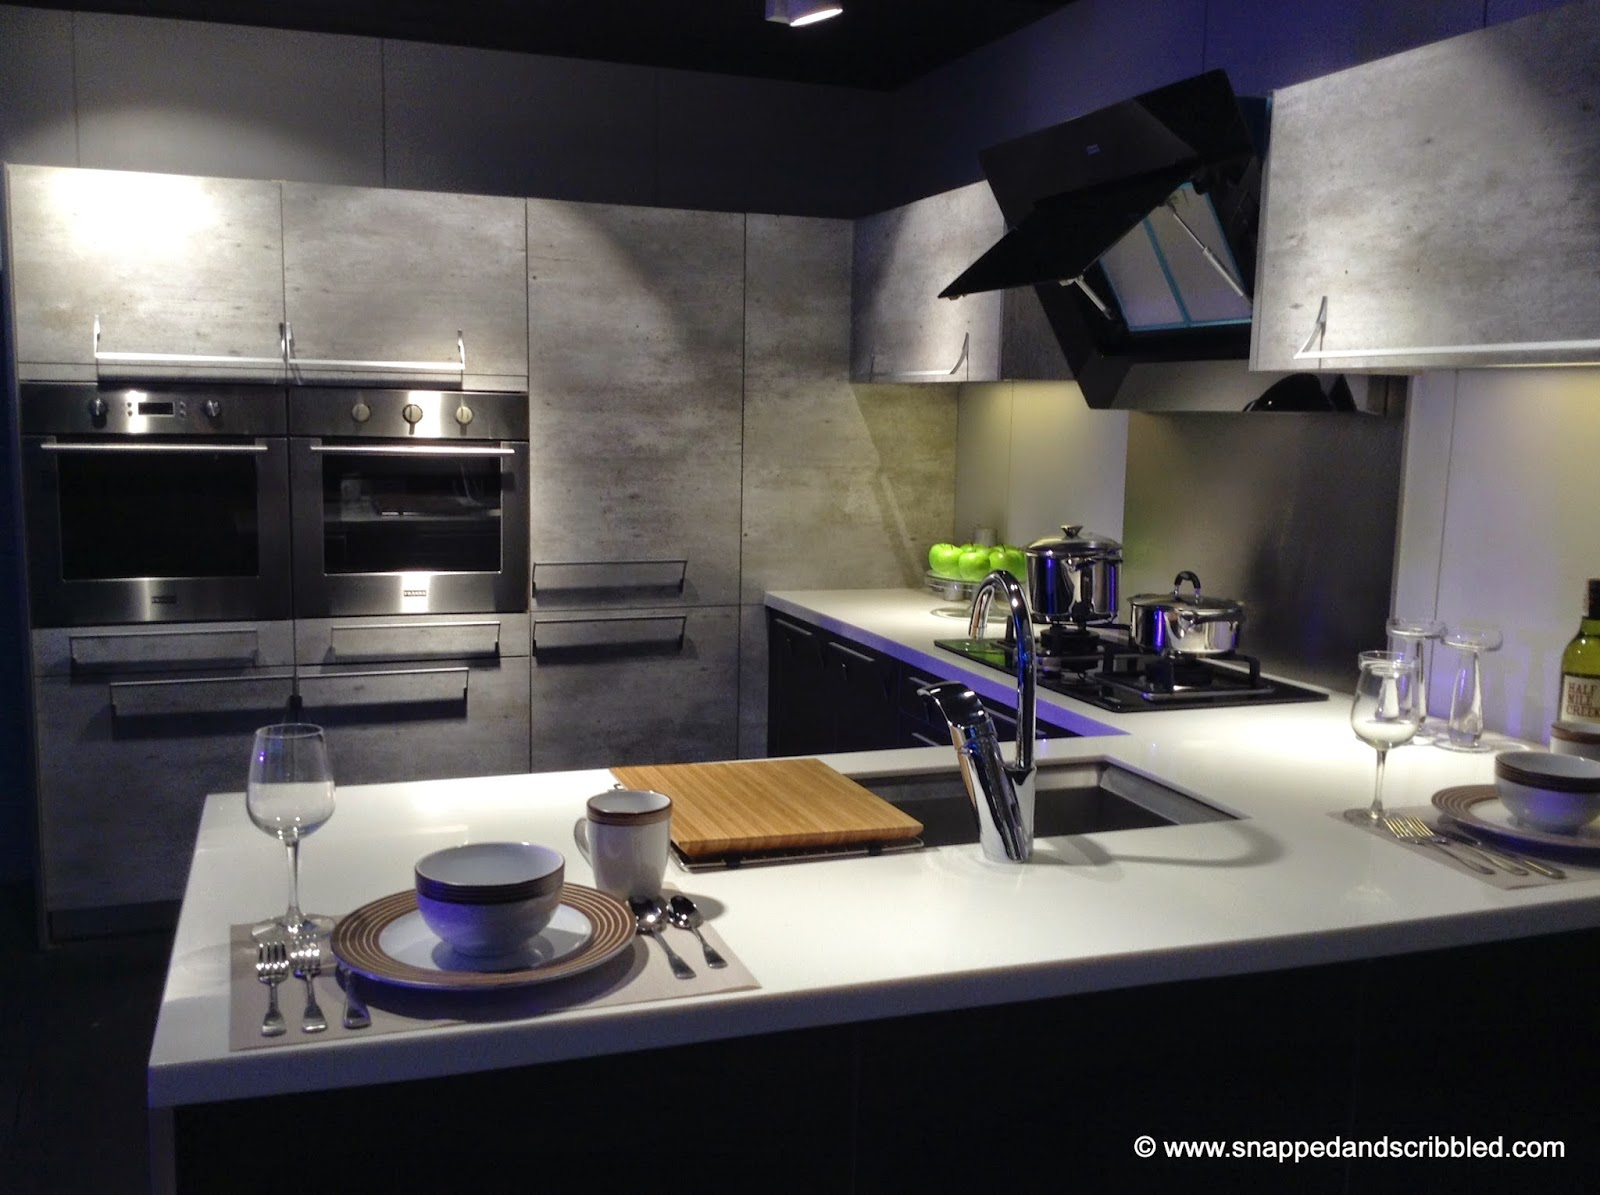 Building Your Dream Kitchen: Kohler At Designo Atelier: Build Your Dream Bath And Kitchen